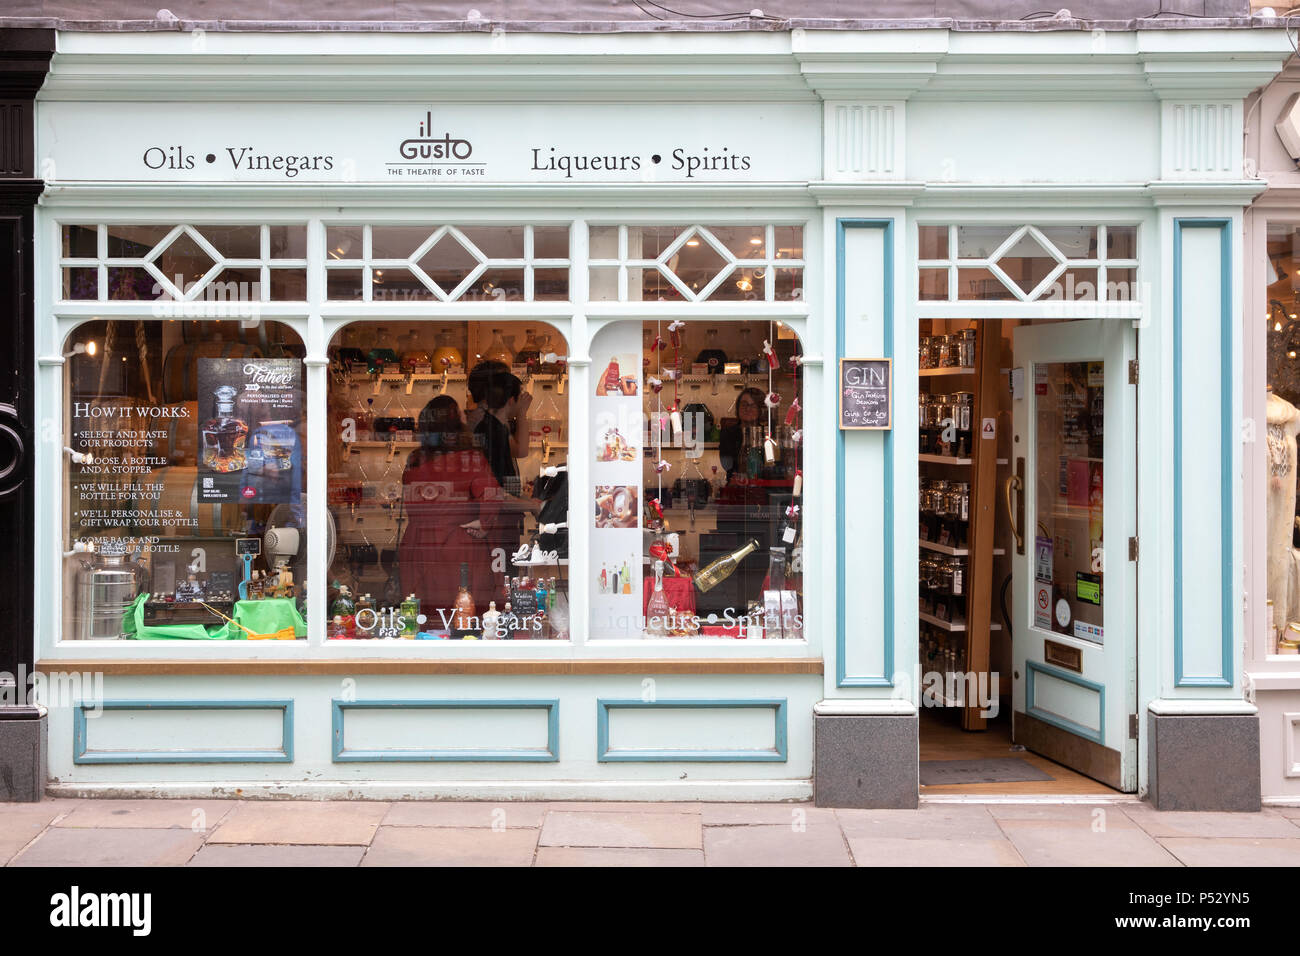 il Gusto store in York, Uk - Stock Image